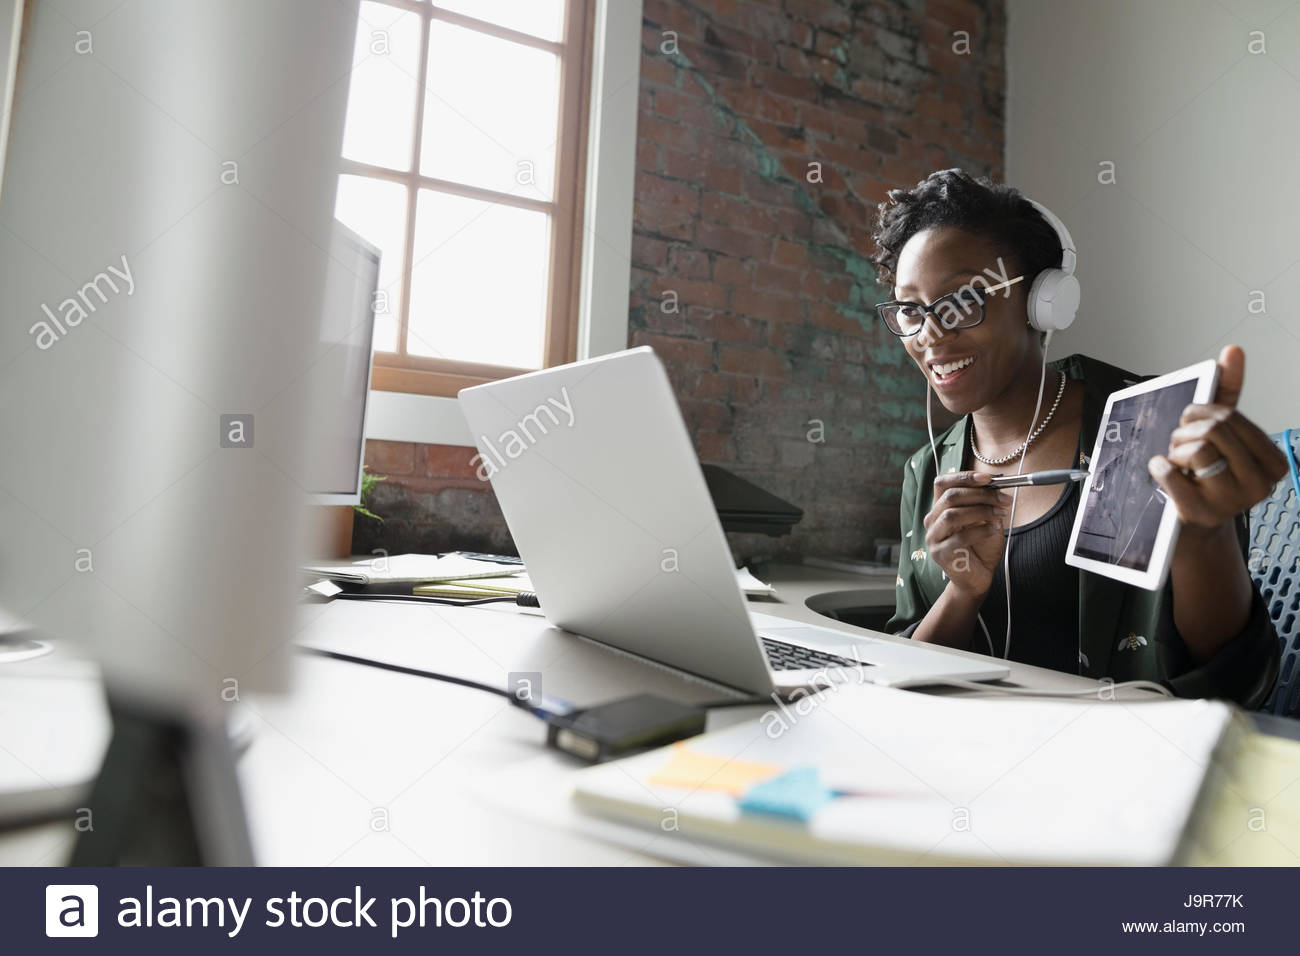 Creative businesswoman Smiling with headphones holding digital tablet et vidéoconférence à laptop in office Banque D'Images